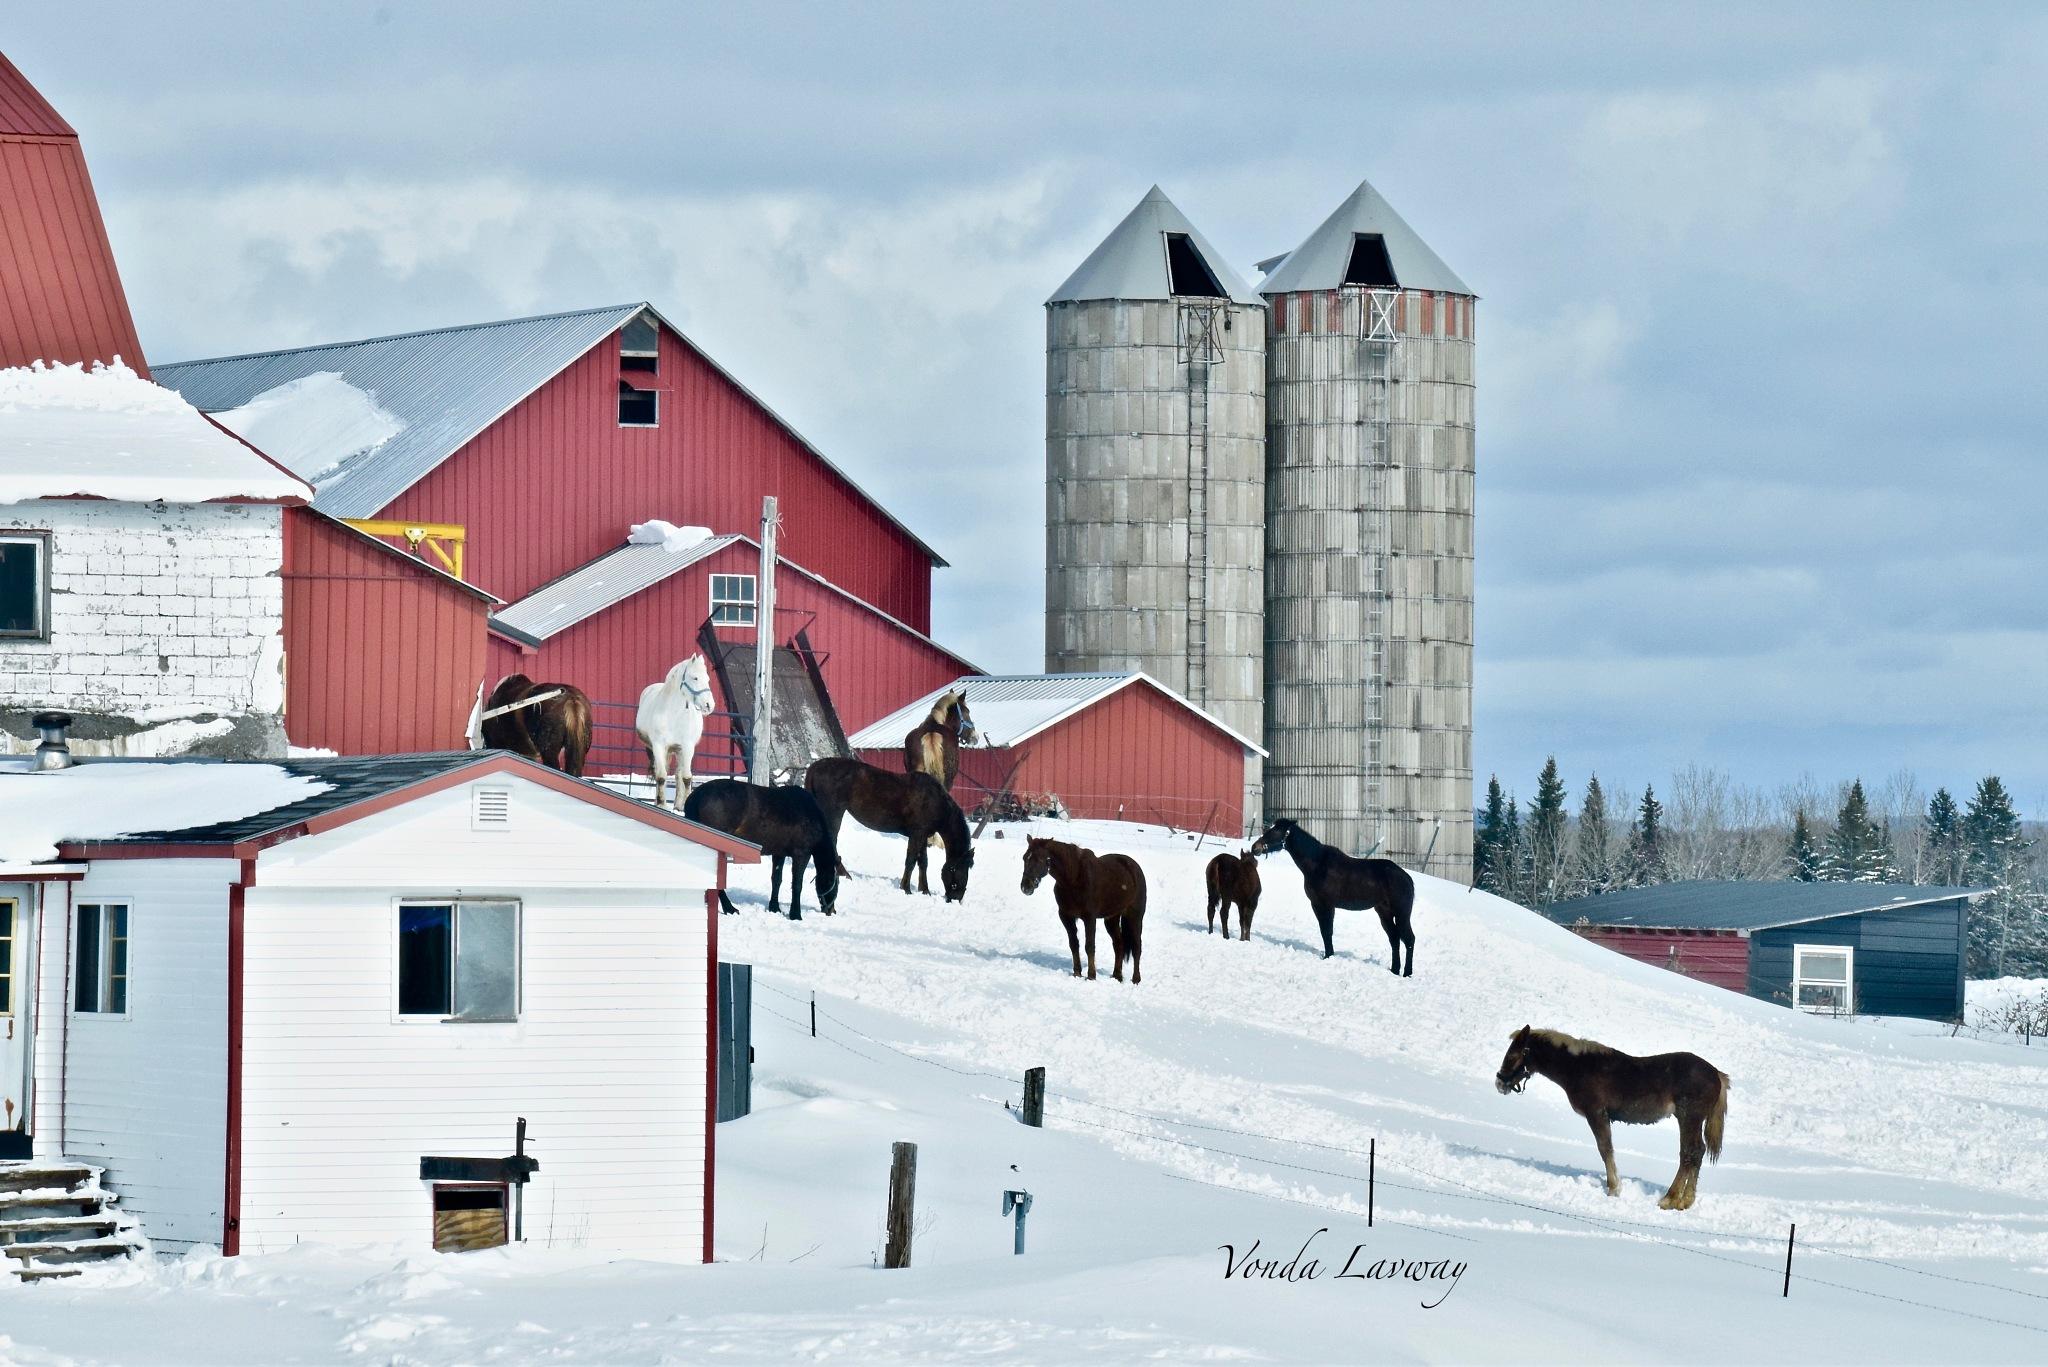 Winter Scene by vonda.lavway